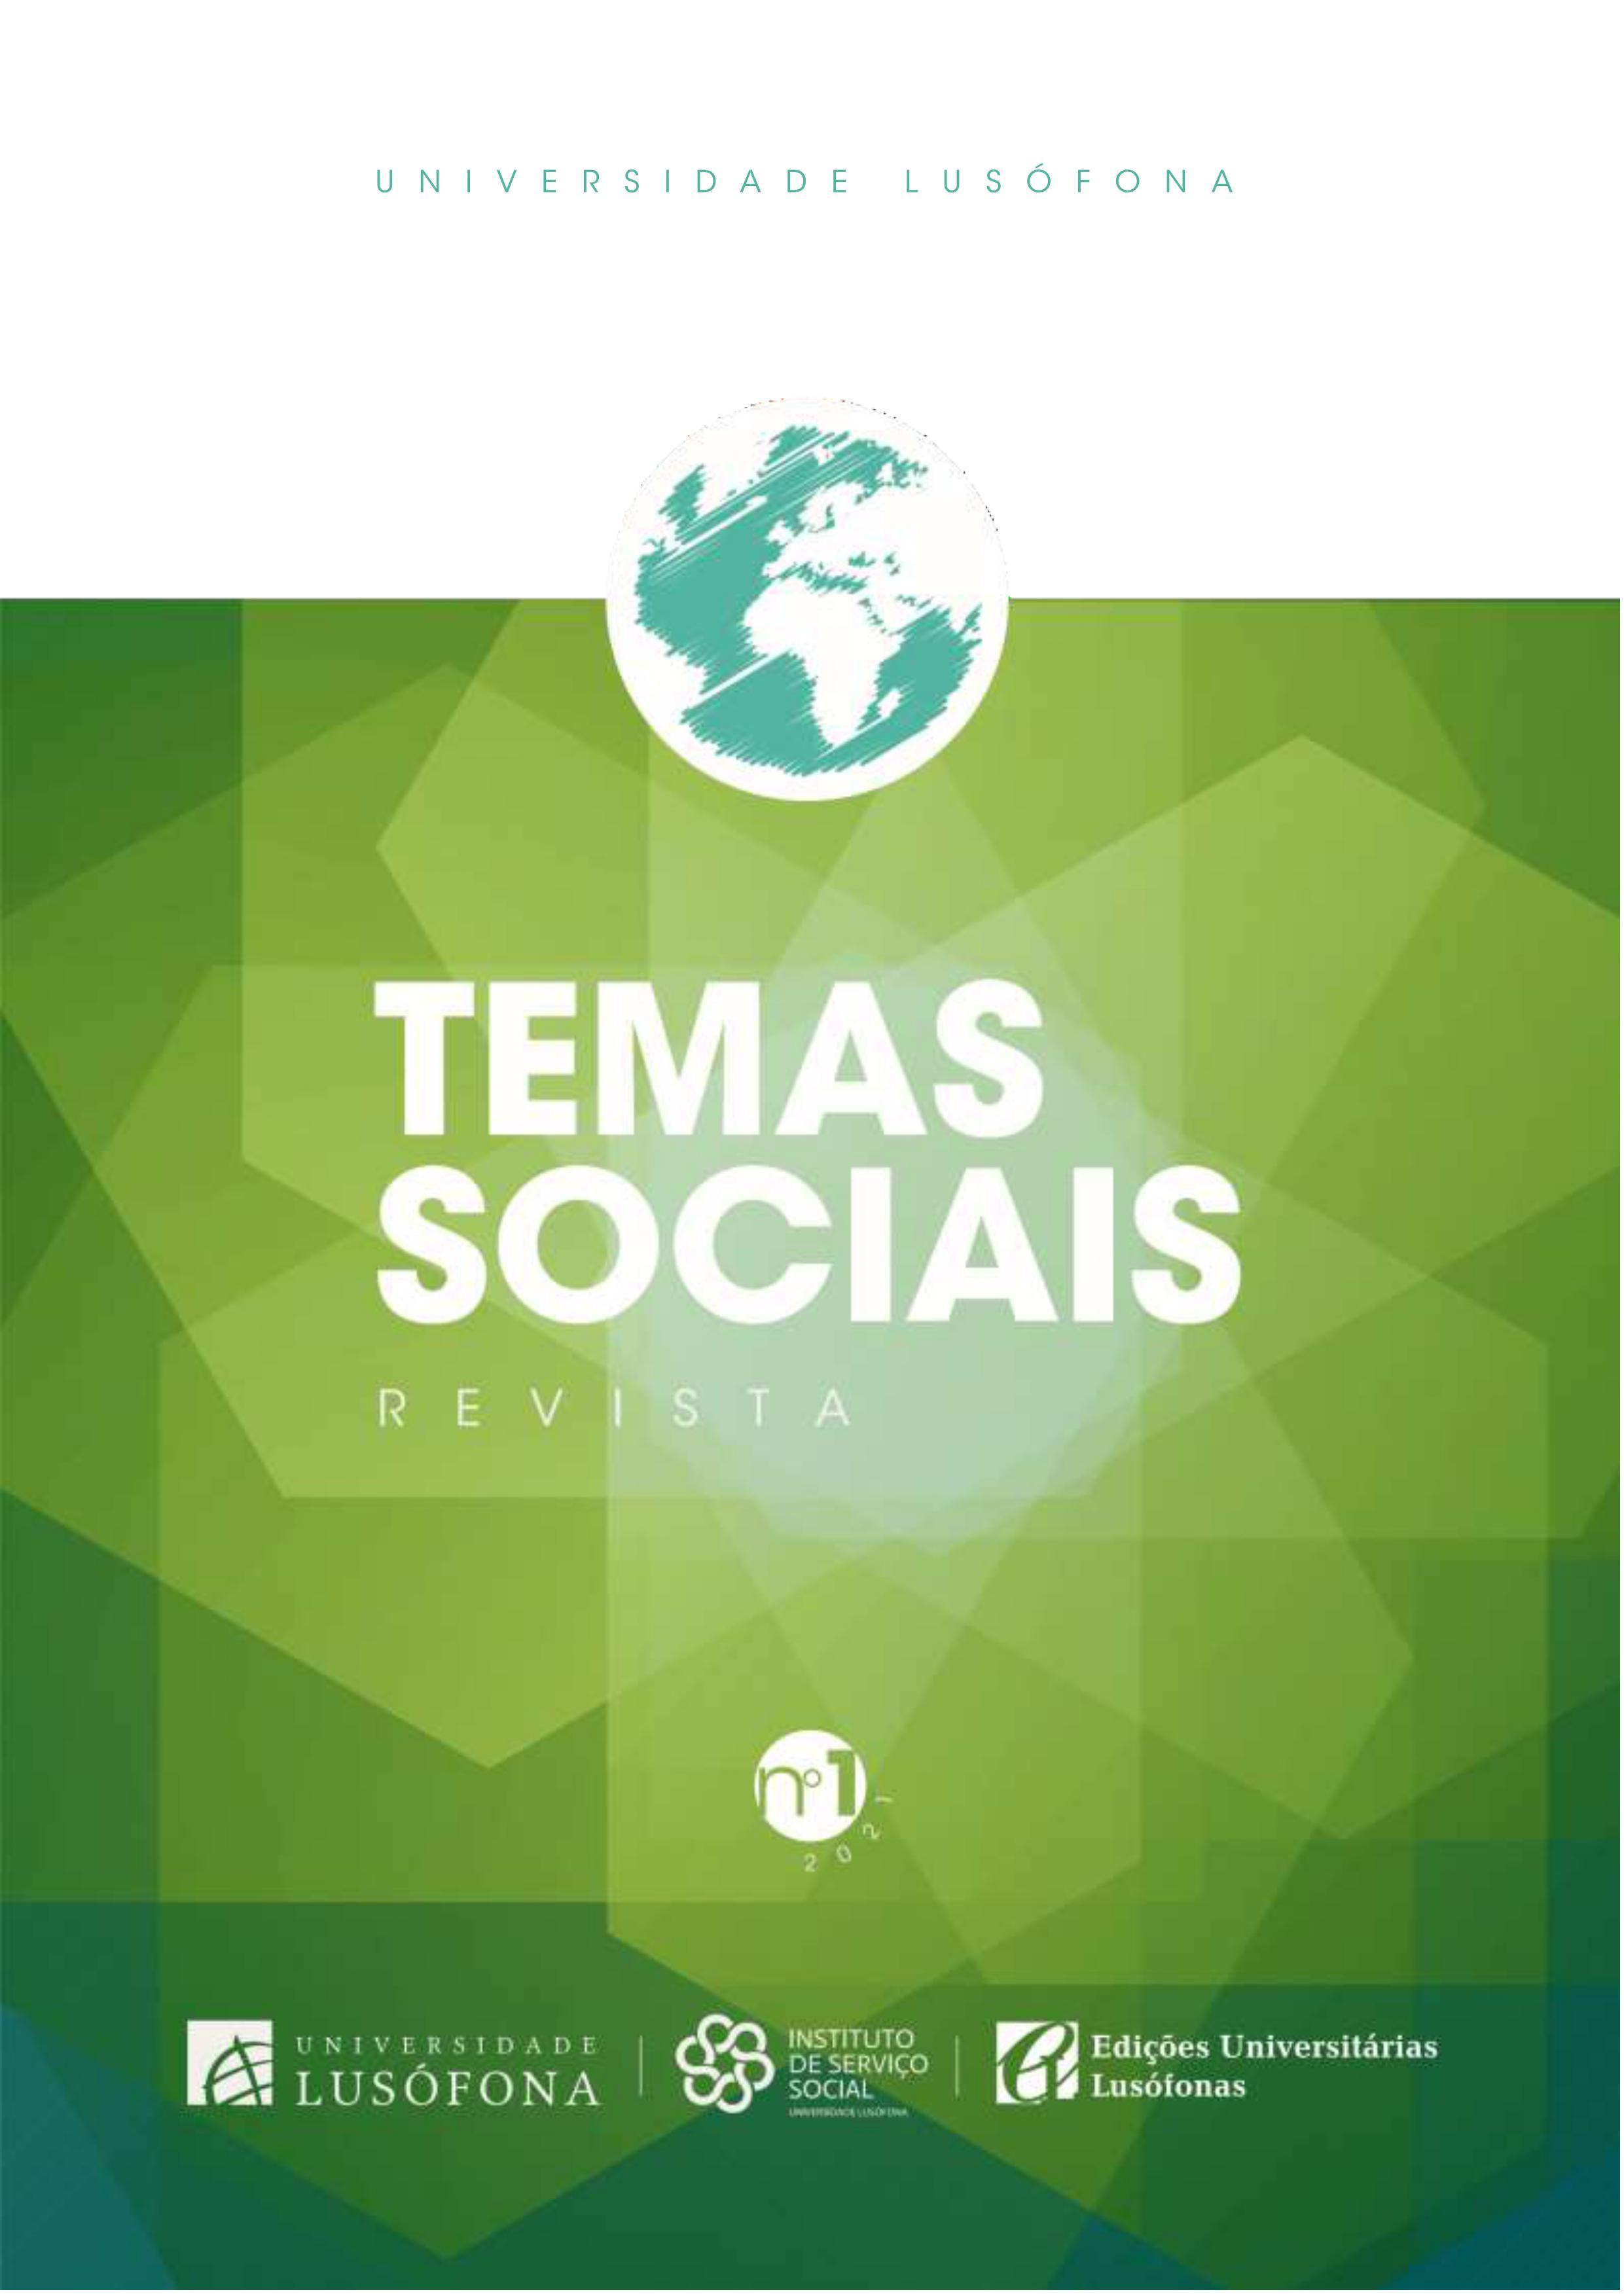 Revista Temas Sociais